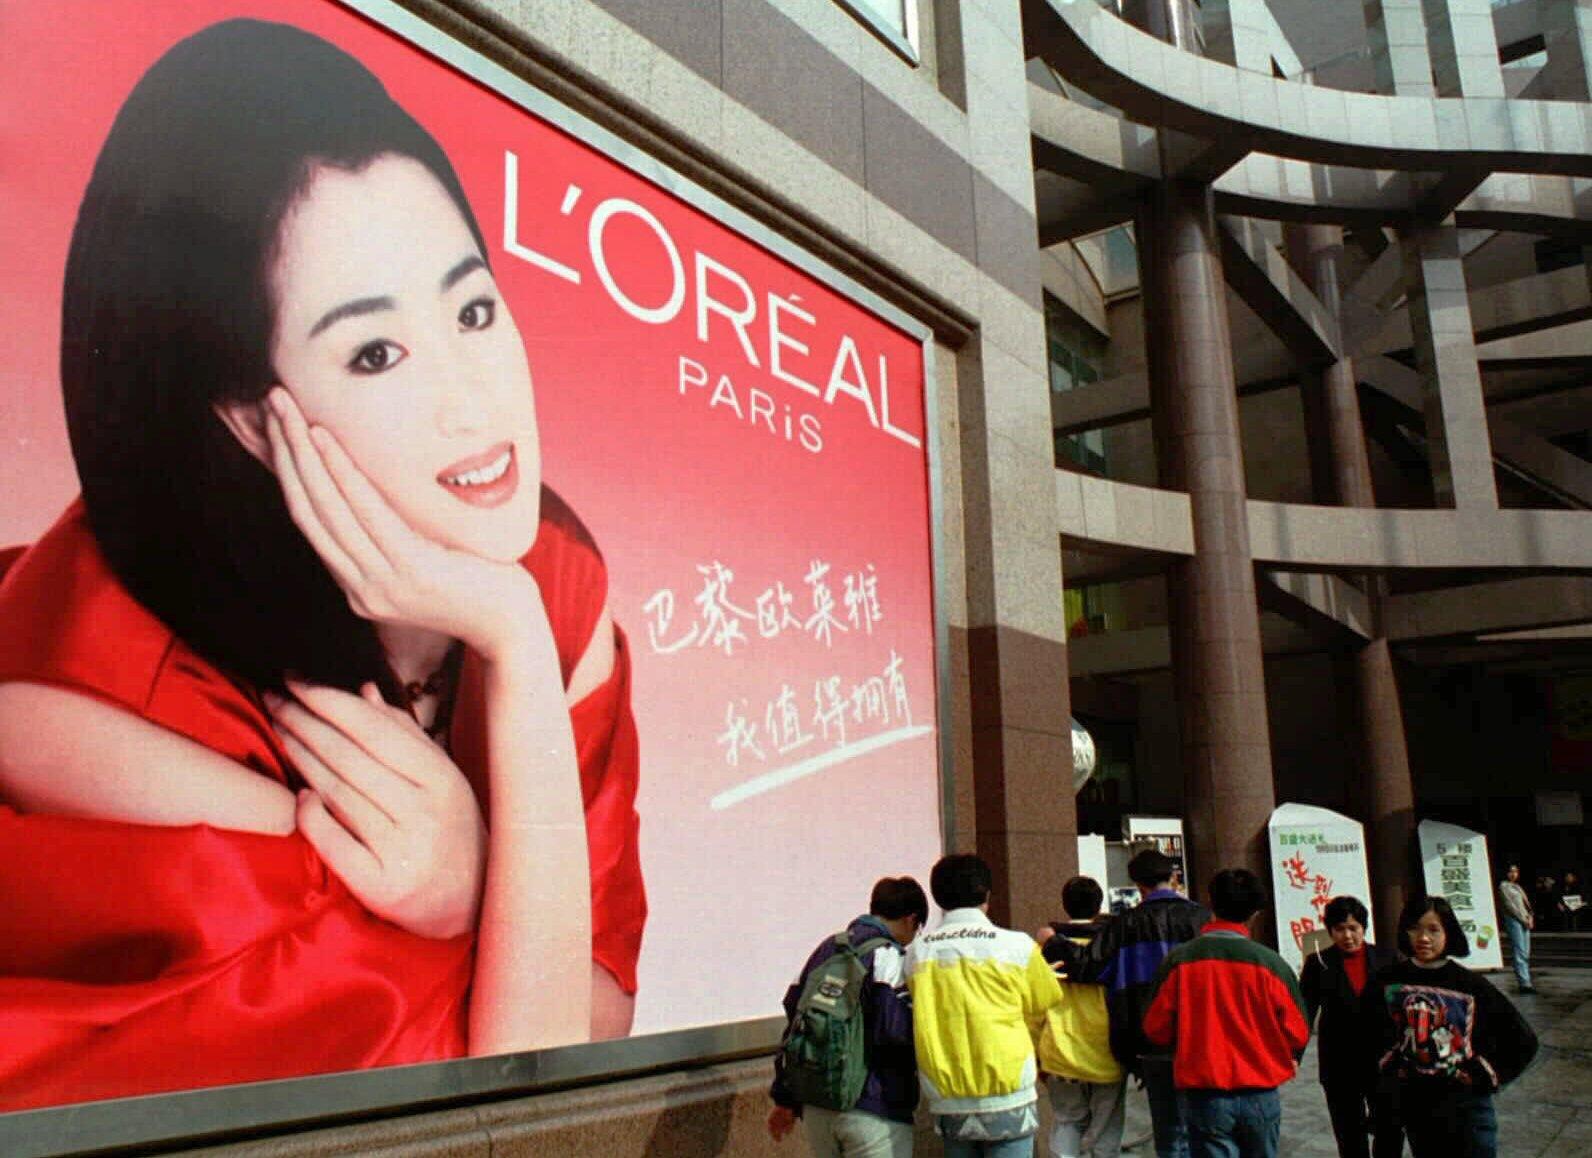 animal testing-free cosmetics china